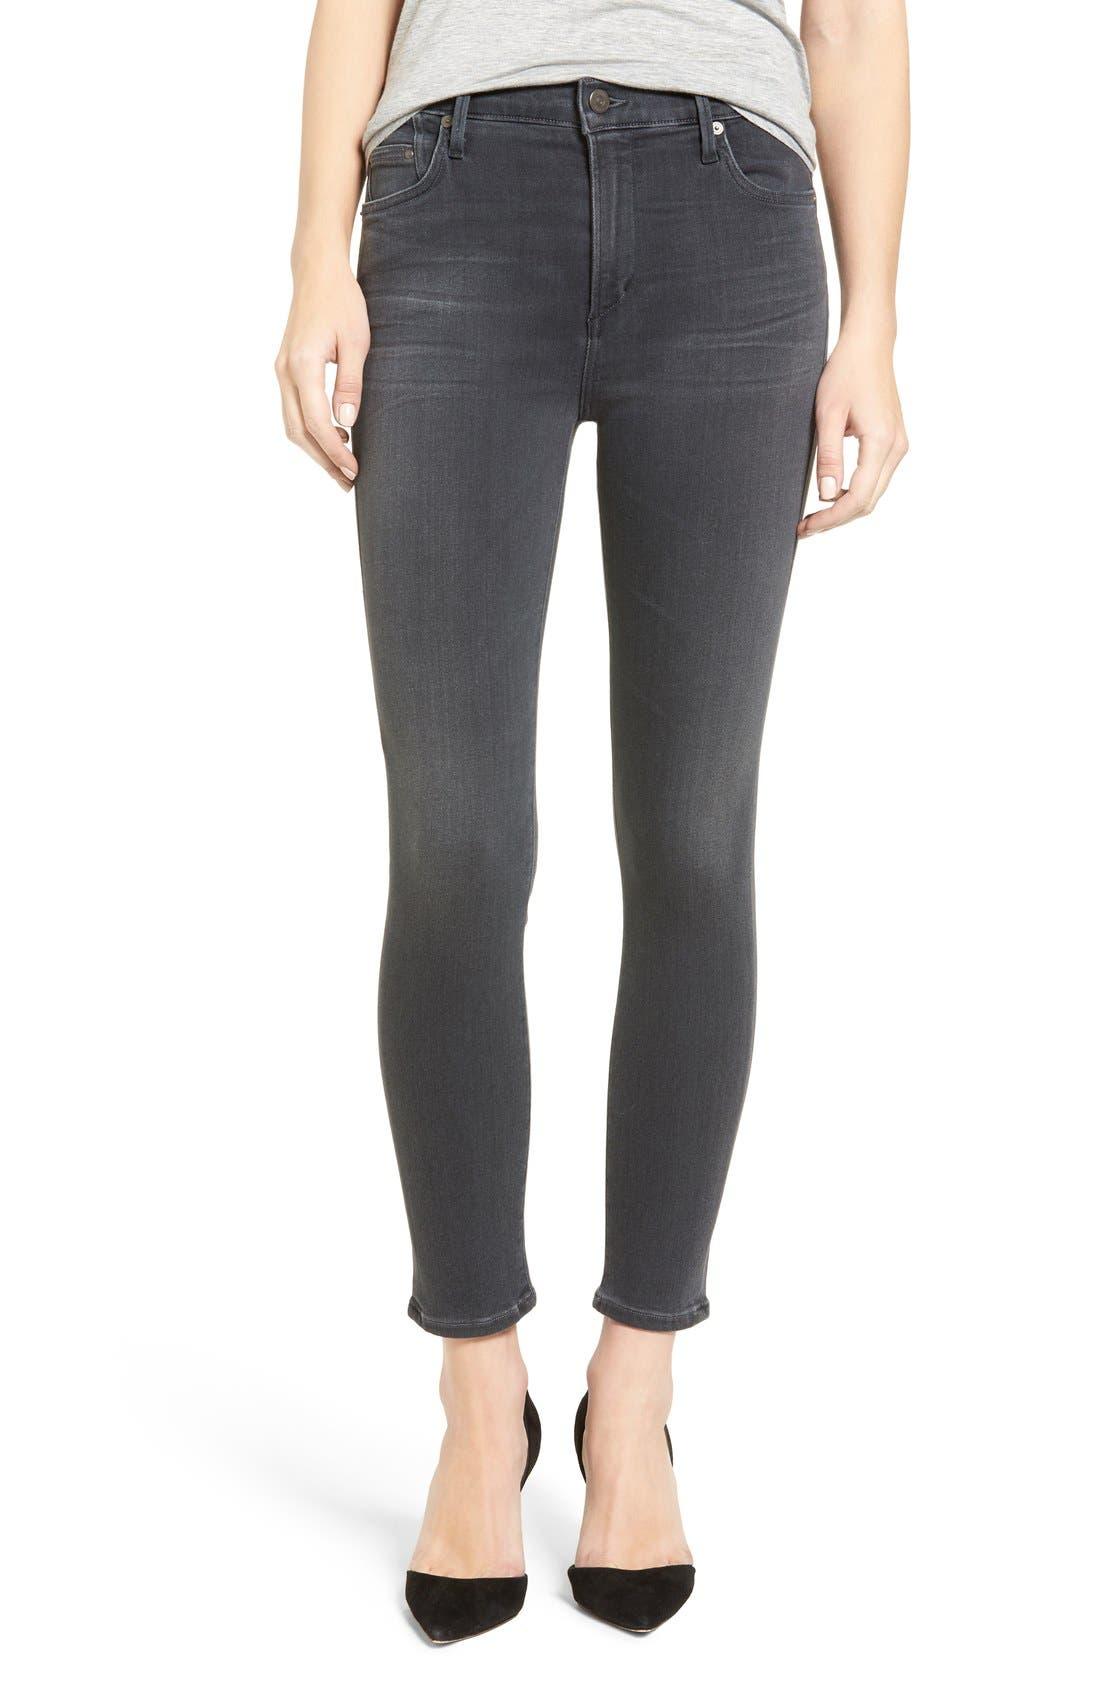 Rocket High Waist Crop Skinny Jeans,                         Main,                         color, Chateau